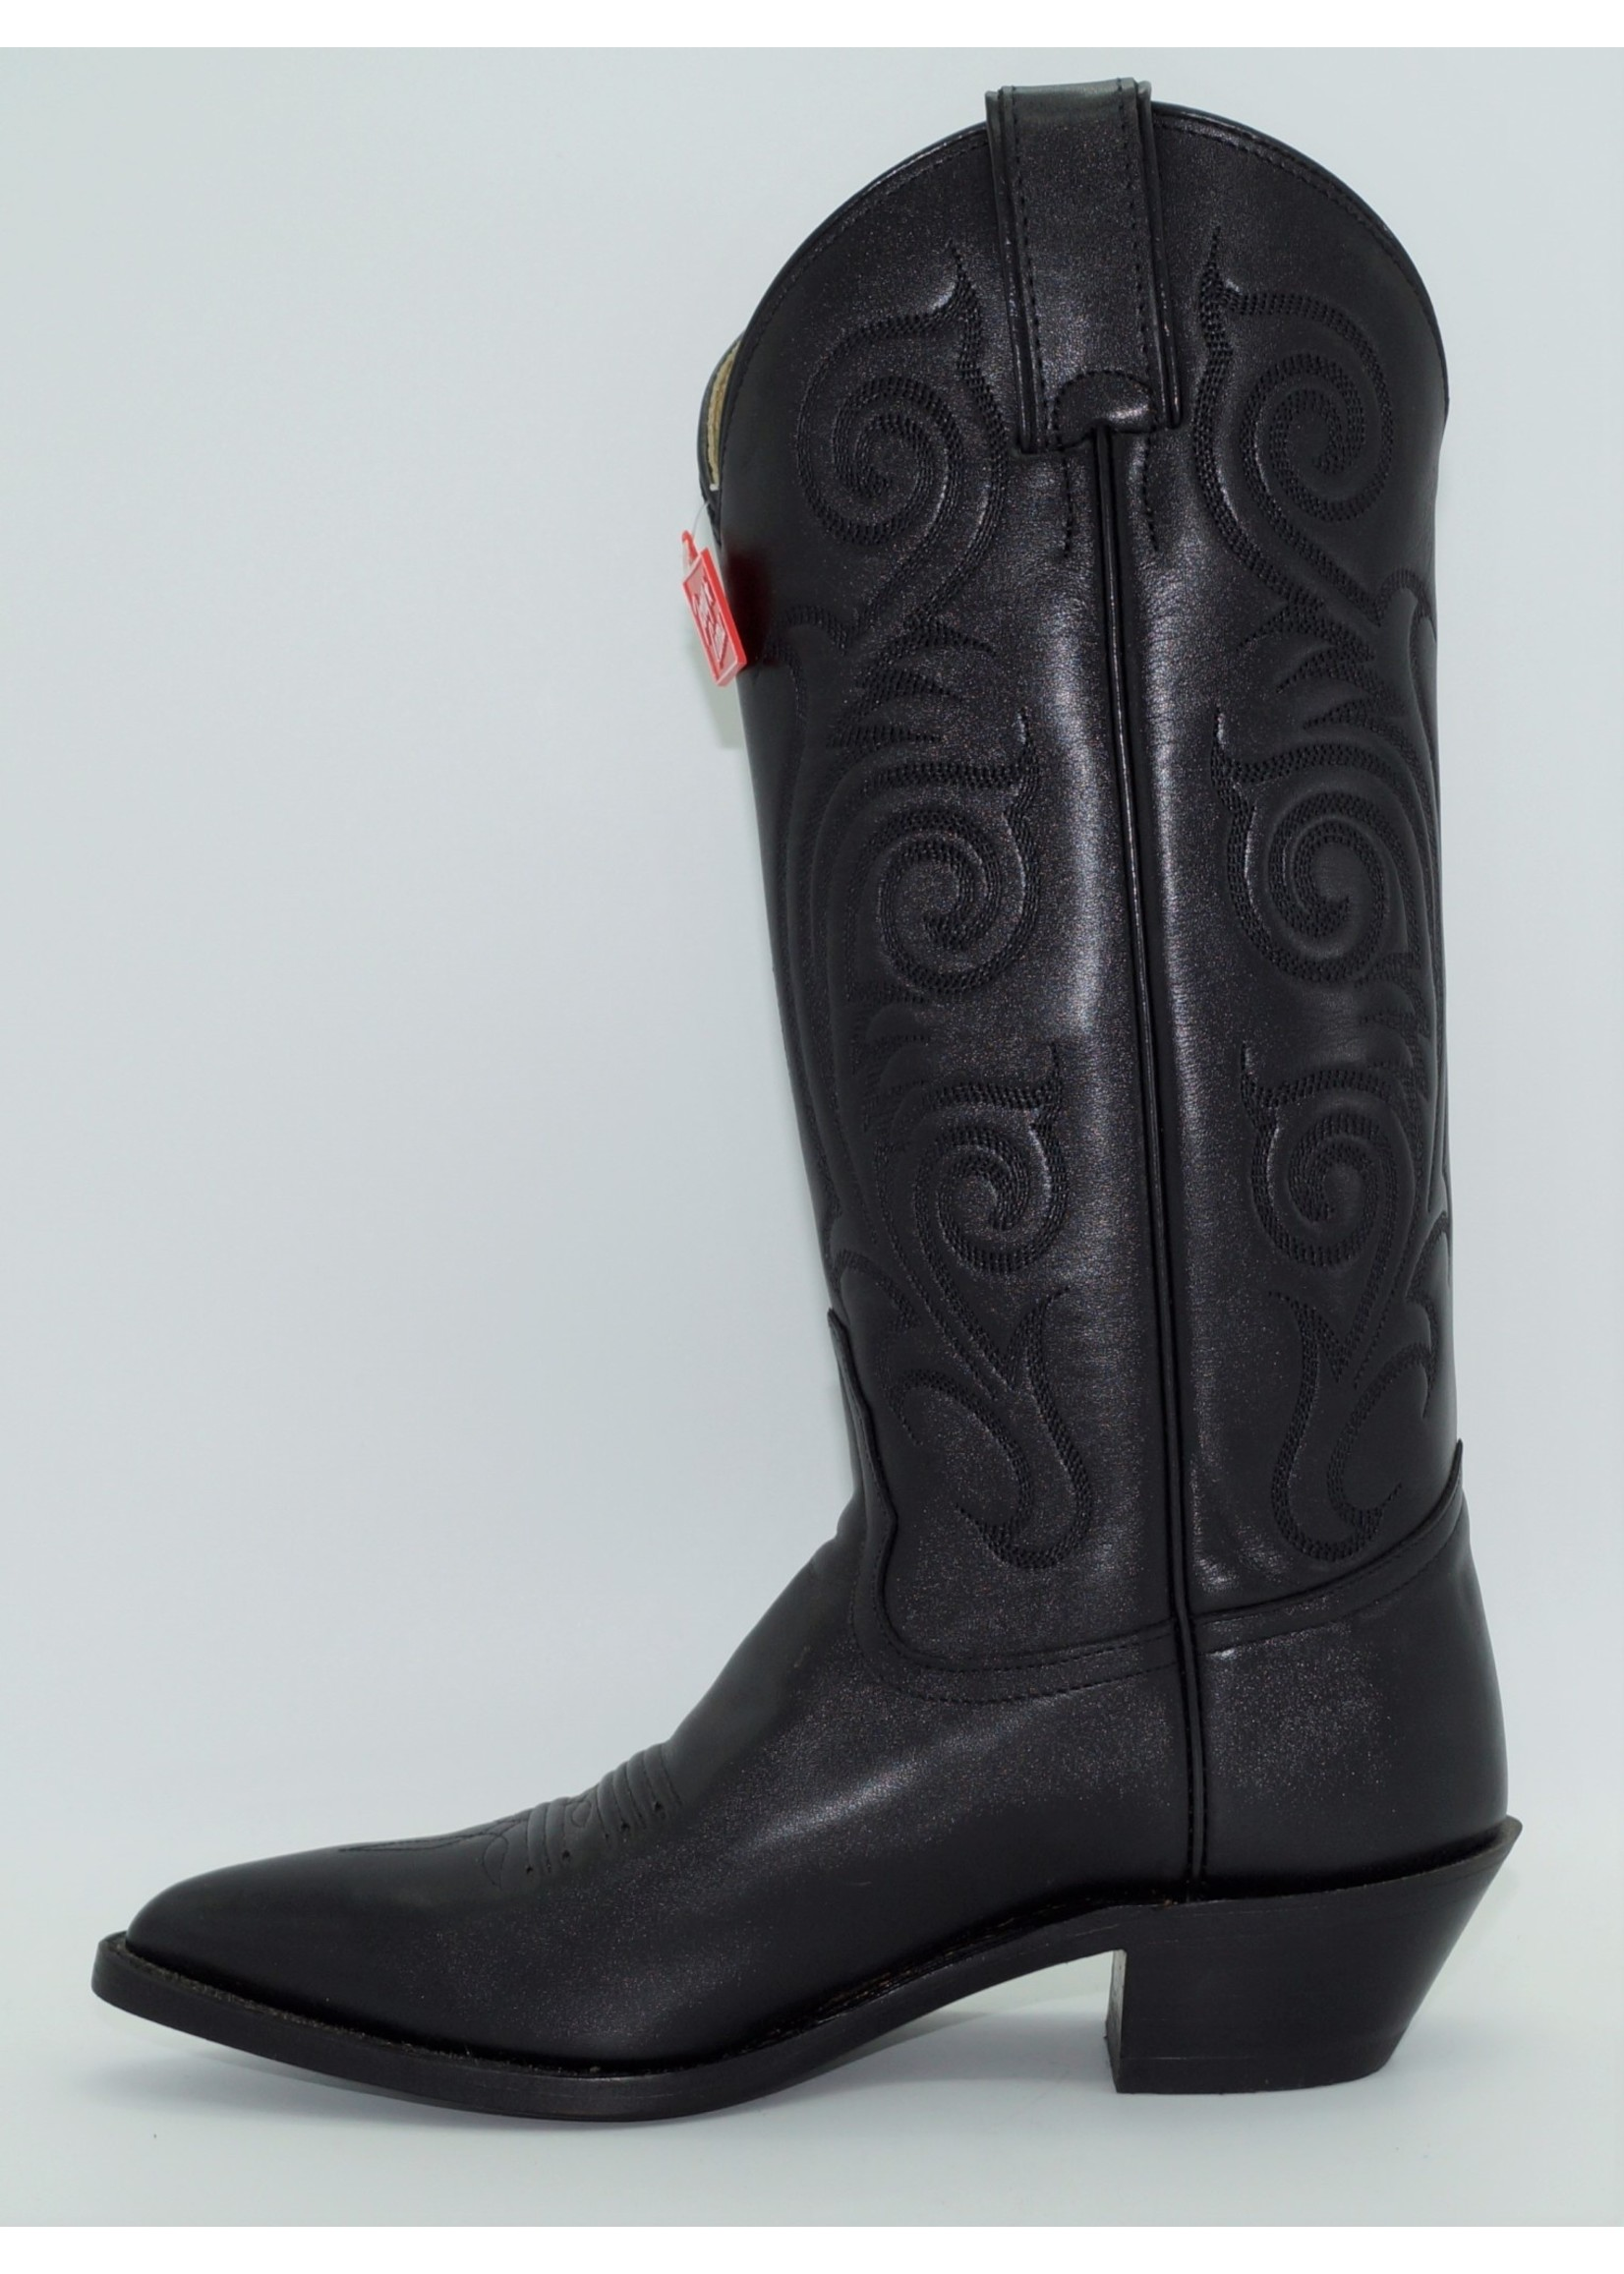 Tony Lama Women's Black Western Dress Boot VL1974